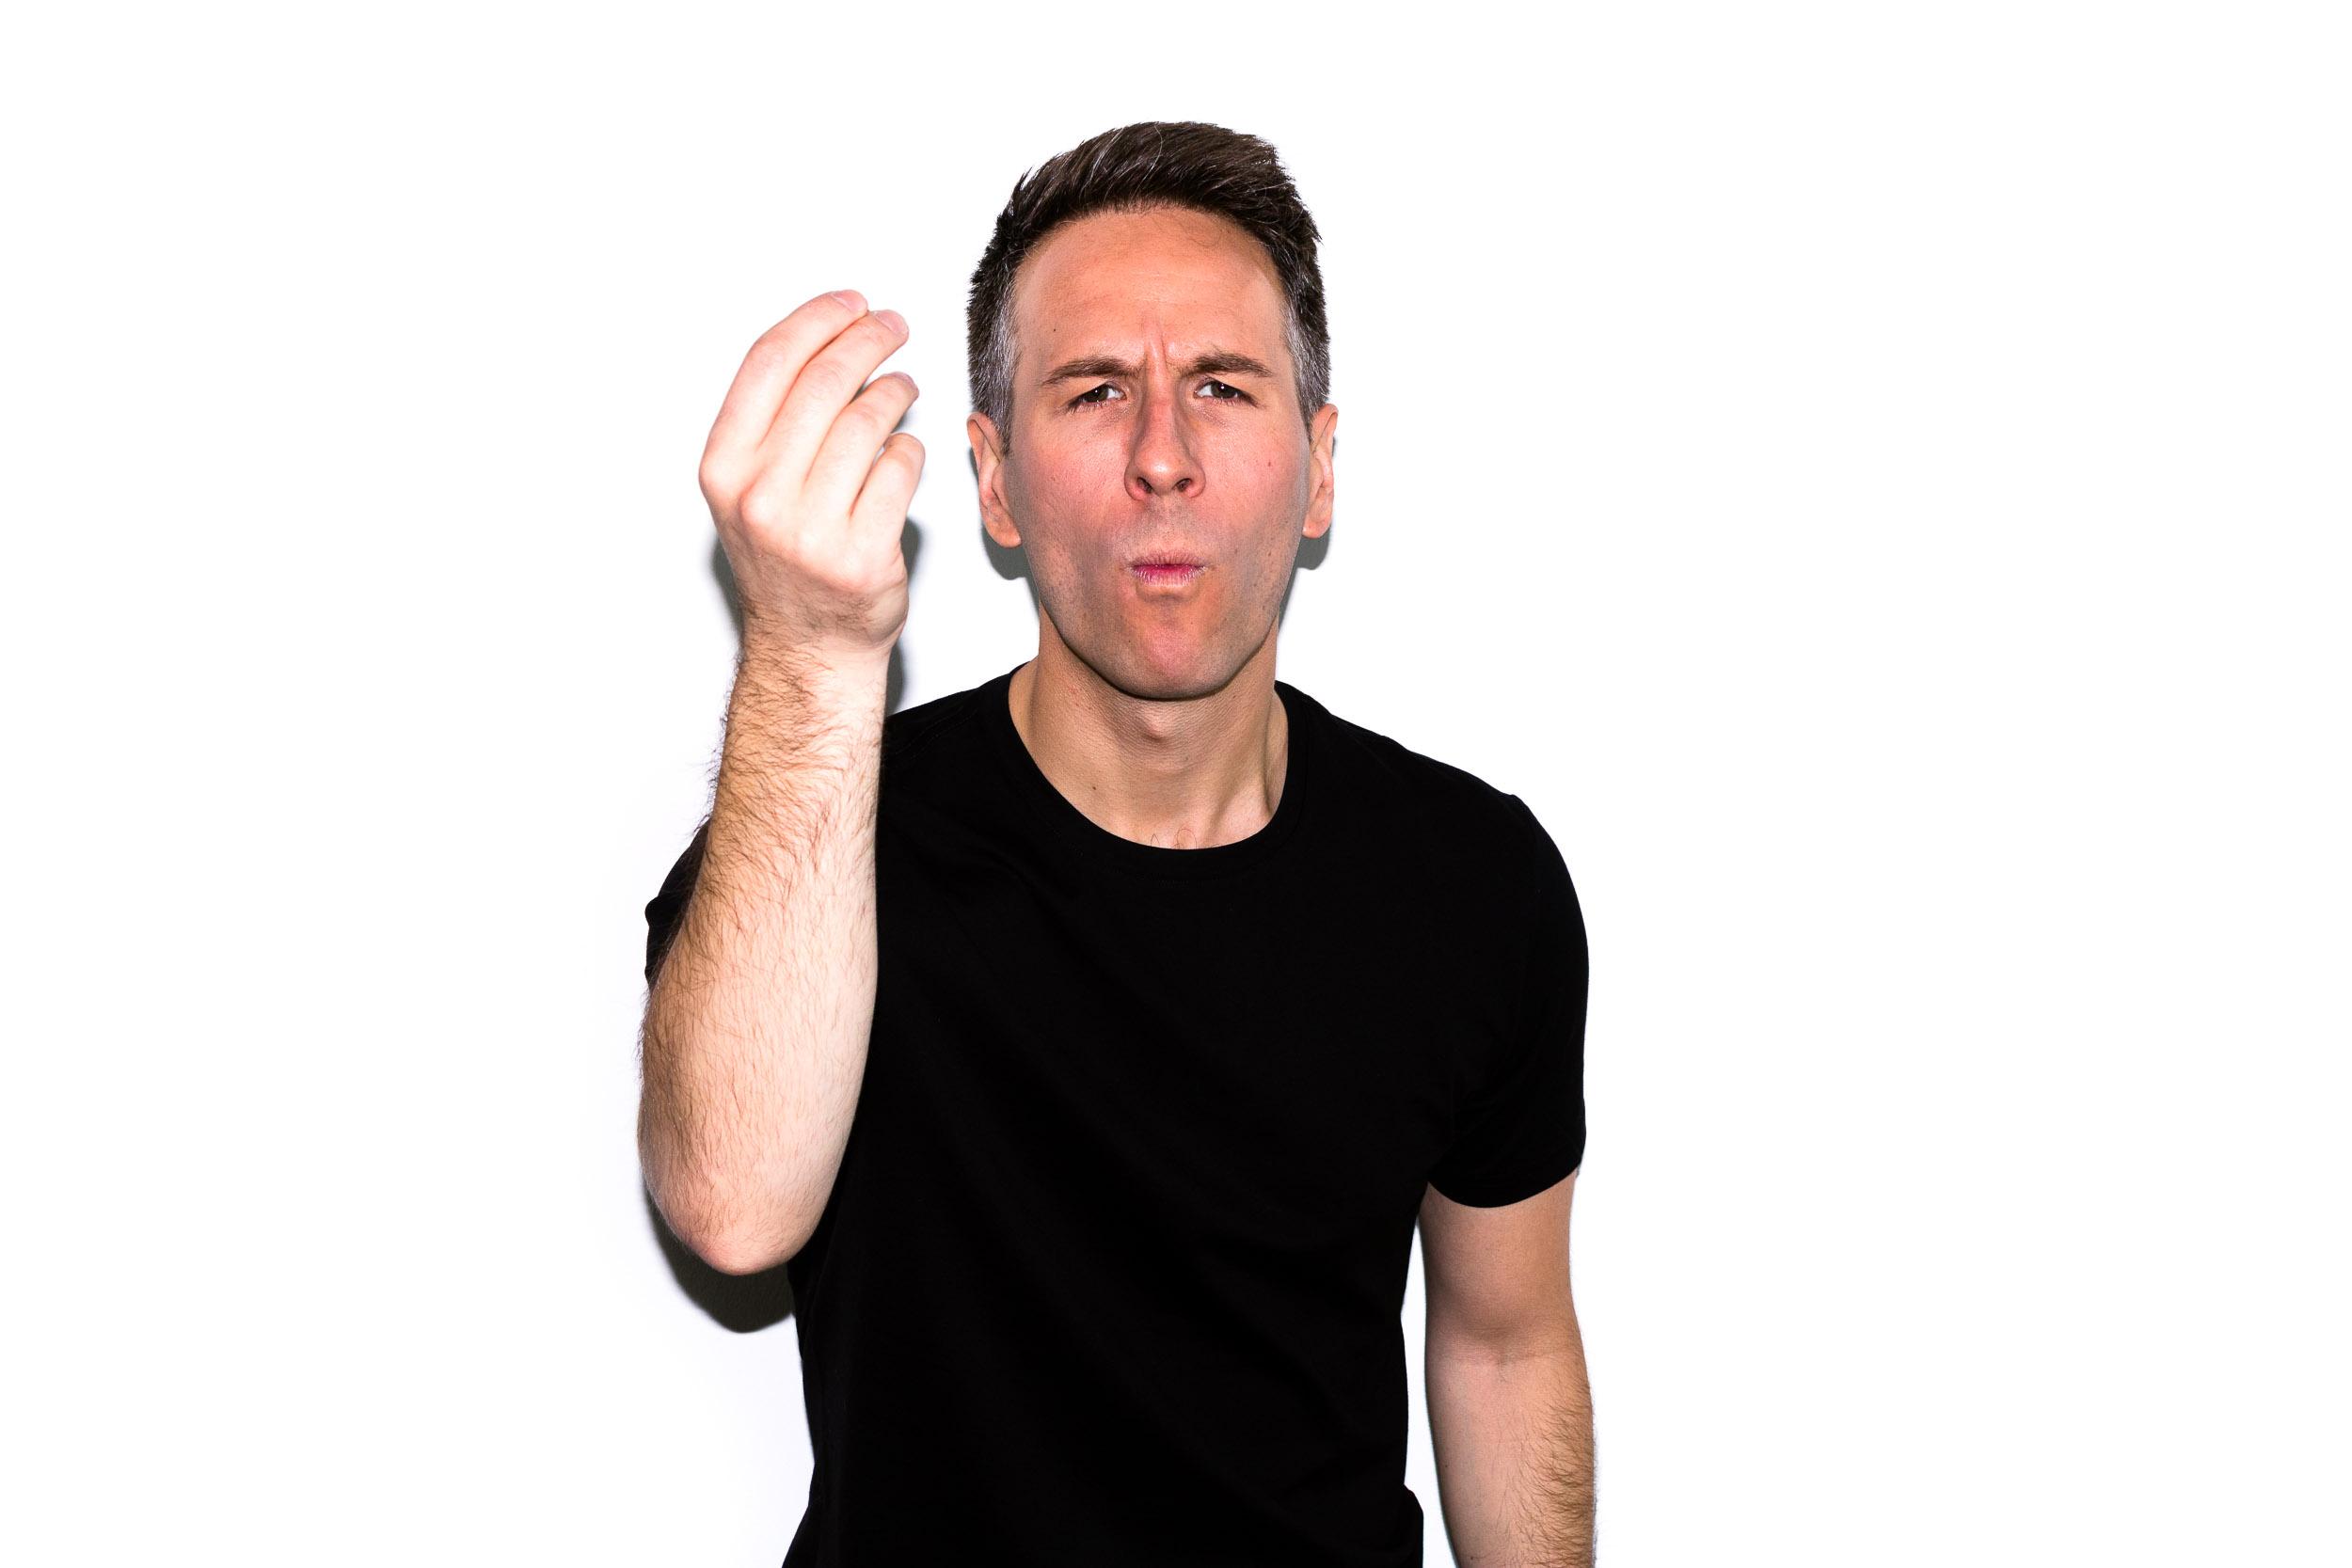 Hi!I'm Anthony LeDonne, the Candid Cook. - [don't laugh...]